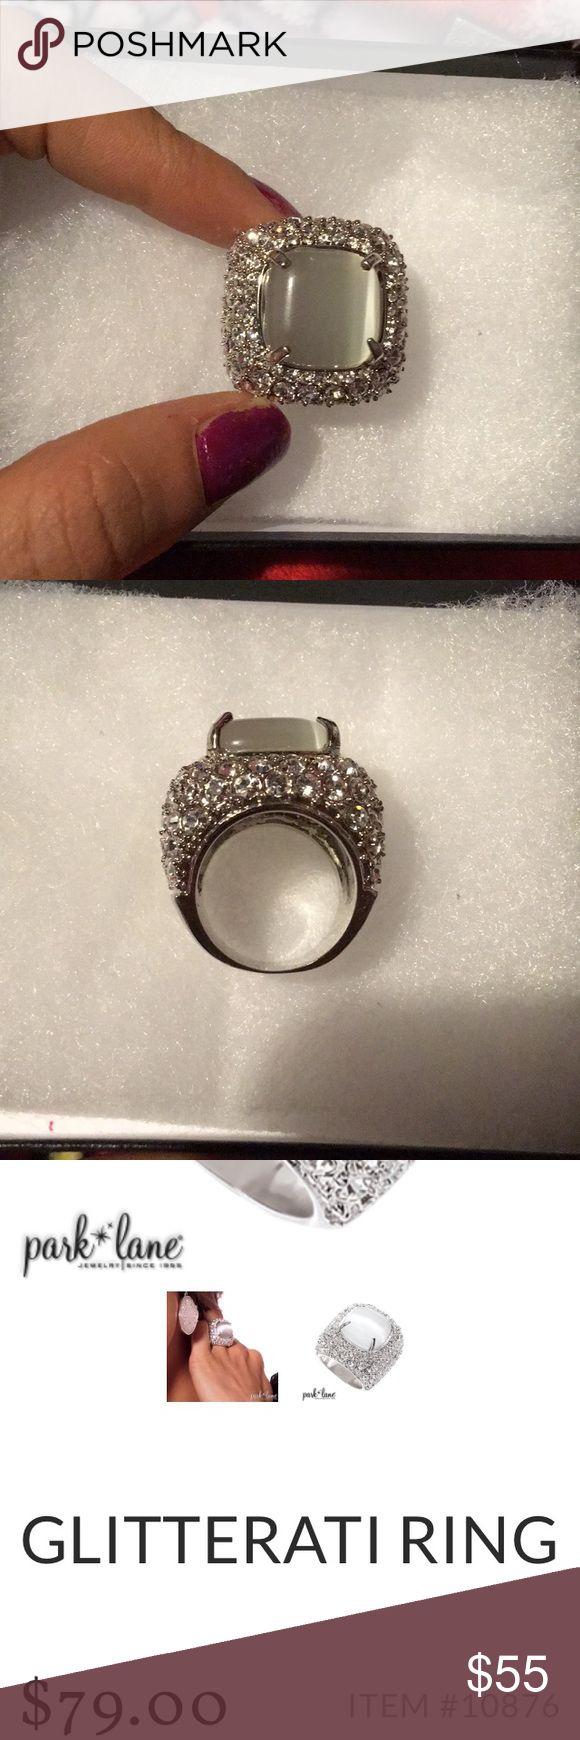 Glitterati ring Beautiful Park Lane ring size 6 Park Lane Jewelry Rings